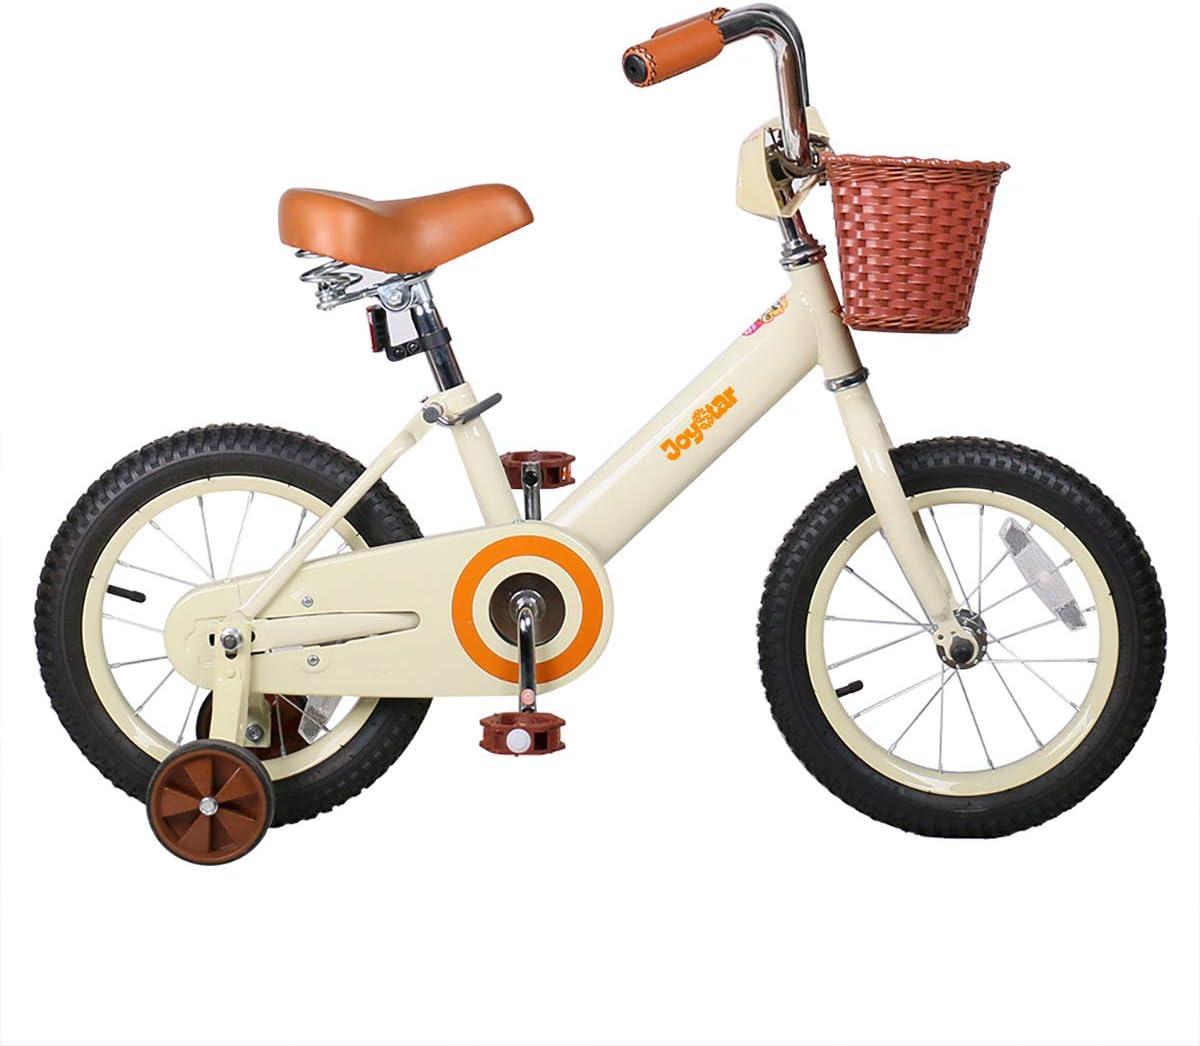 Joystar Vintage Kids Bike